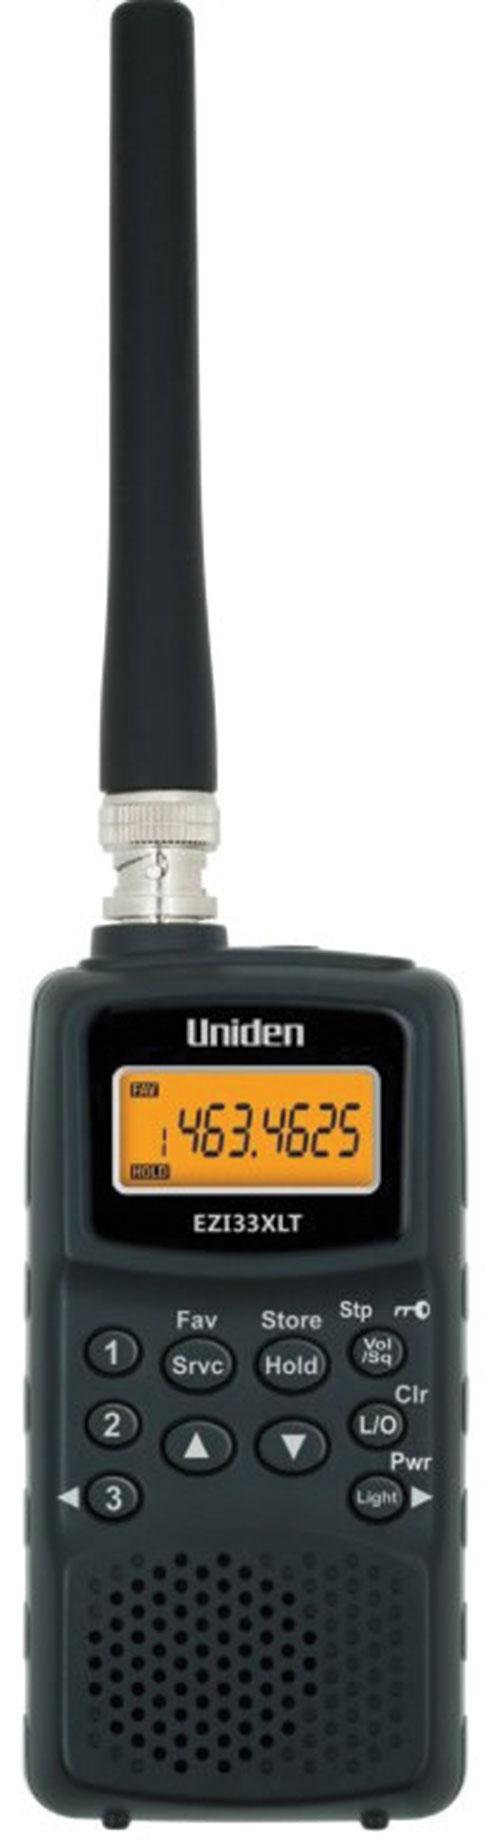 Airband Scanners / Transceivers | Uniden Radio Scanner